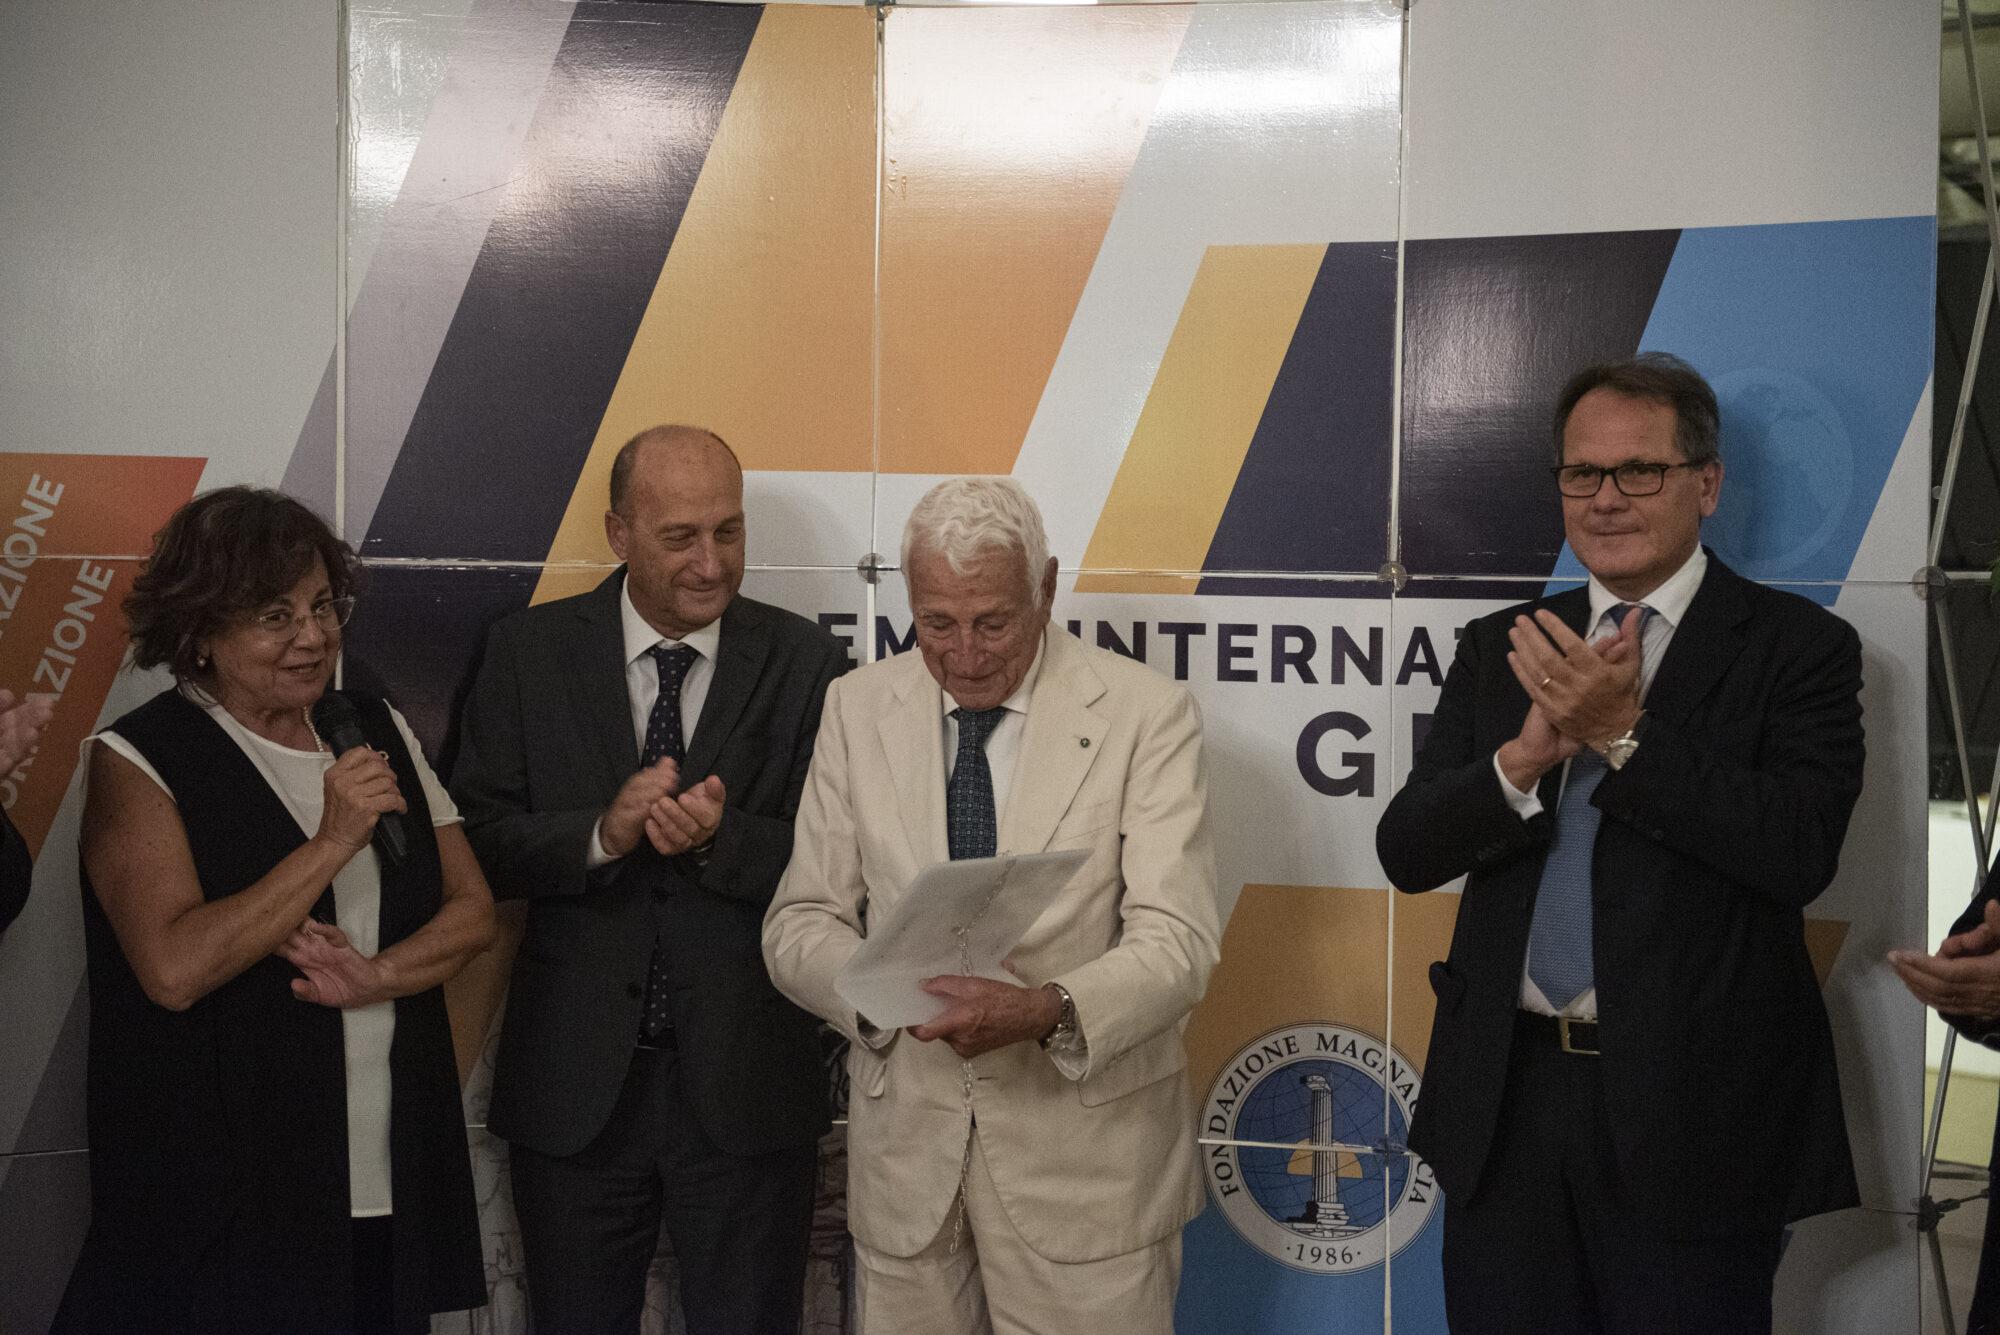 Premio-MG-2019-_-24